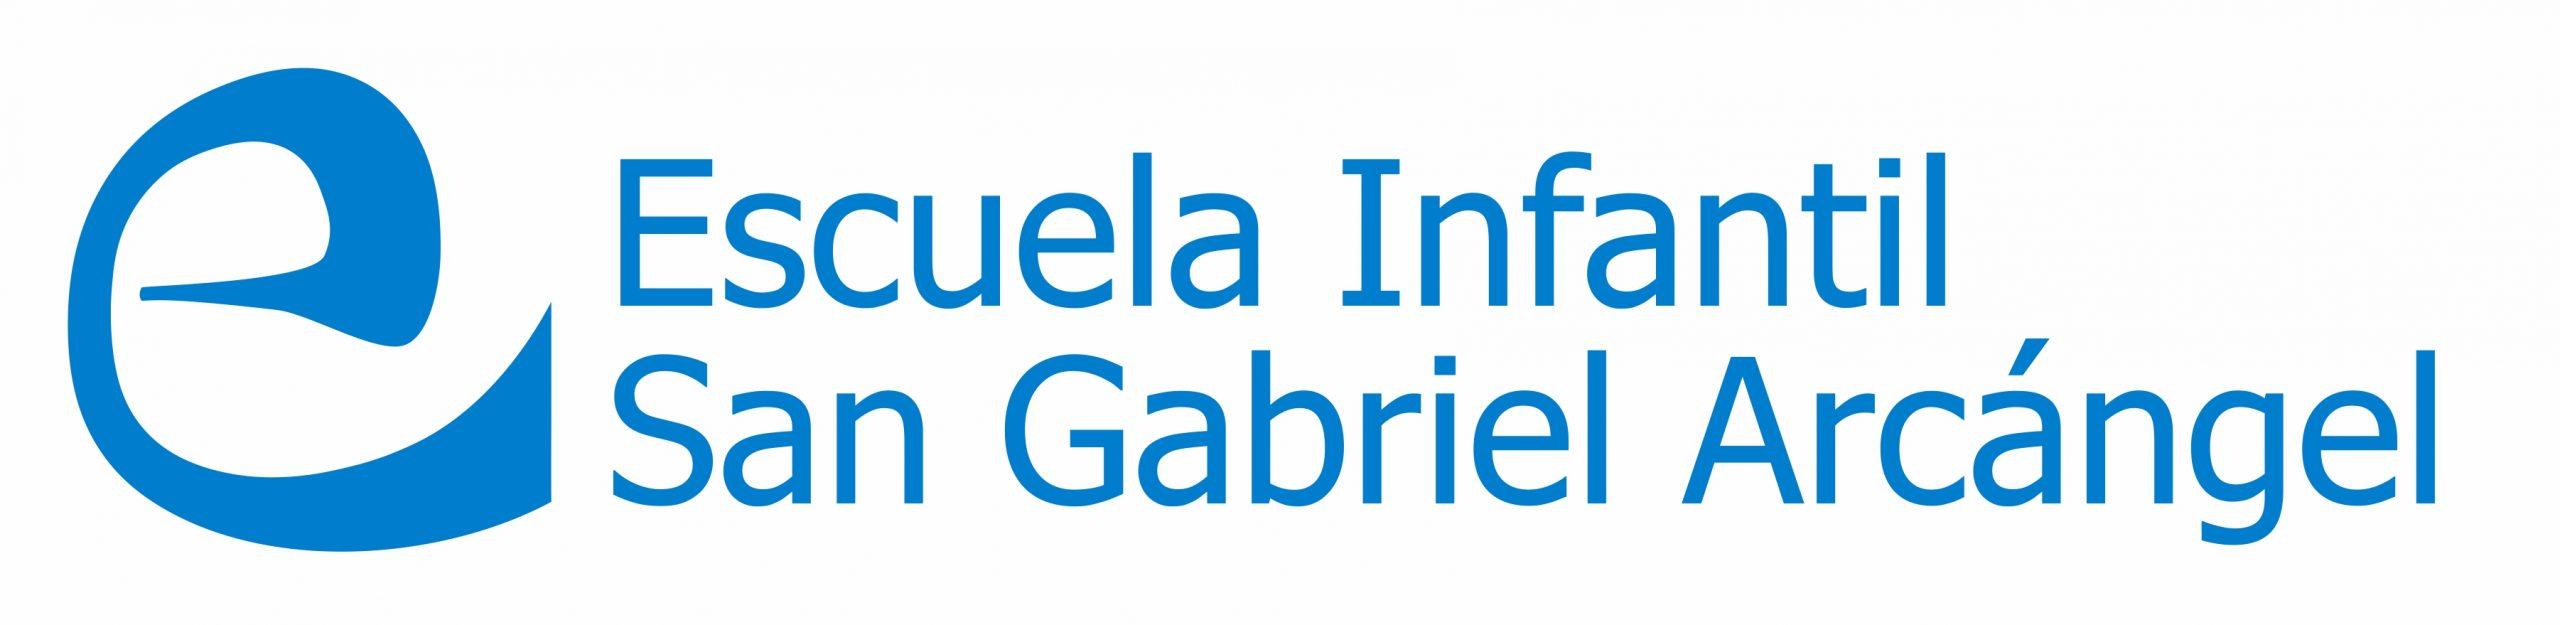 Escuela Infantil San Gabriel Arcángel